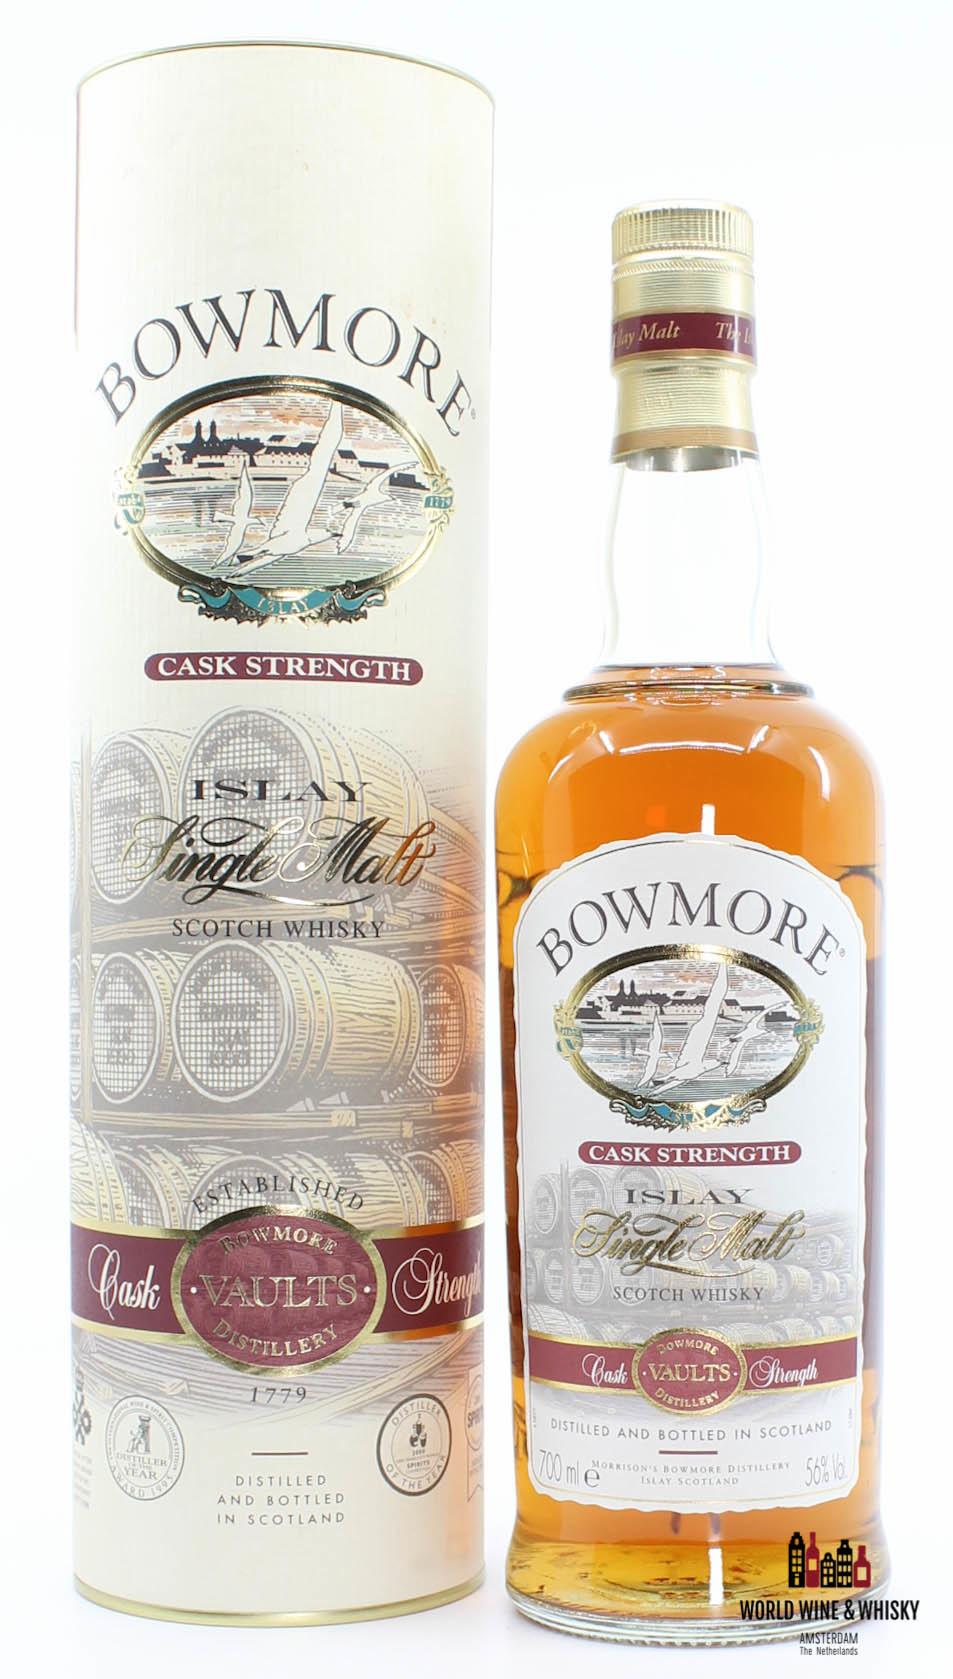 Bowmore Bowmore Cask Strength 2002 56% (700 ml)